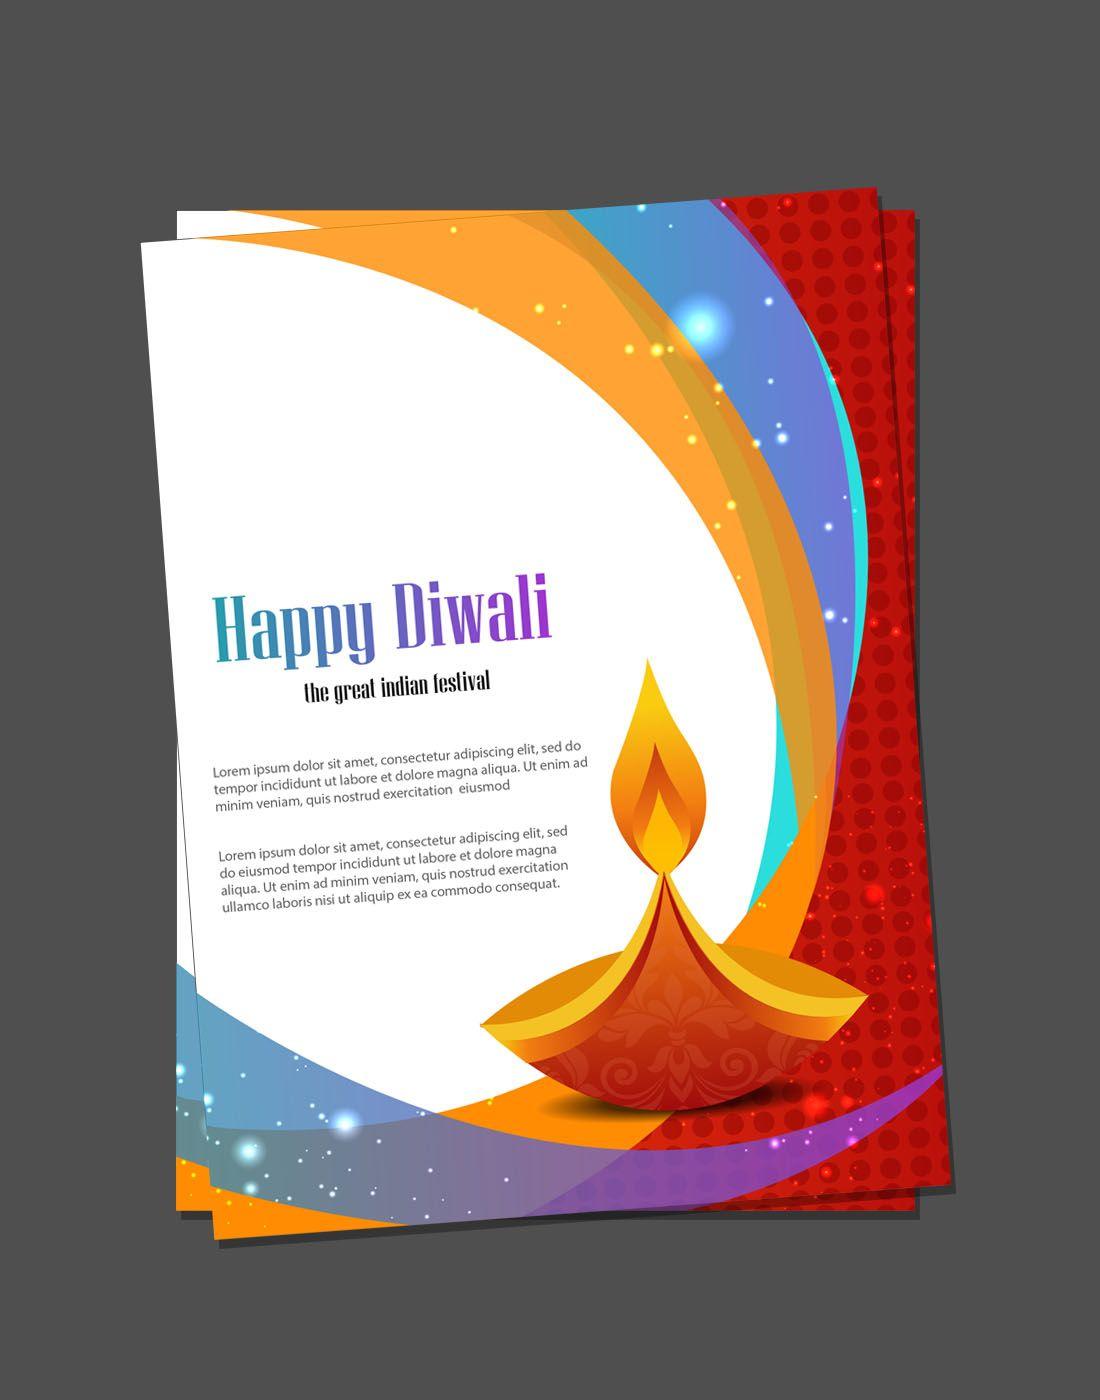 diwali card templates | diwali vector templates | Pinterest | Diwali ...